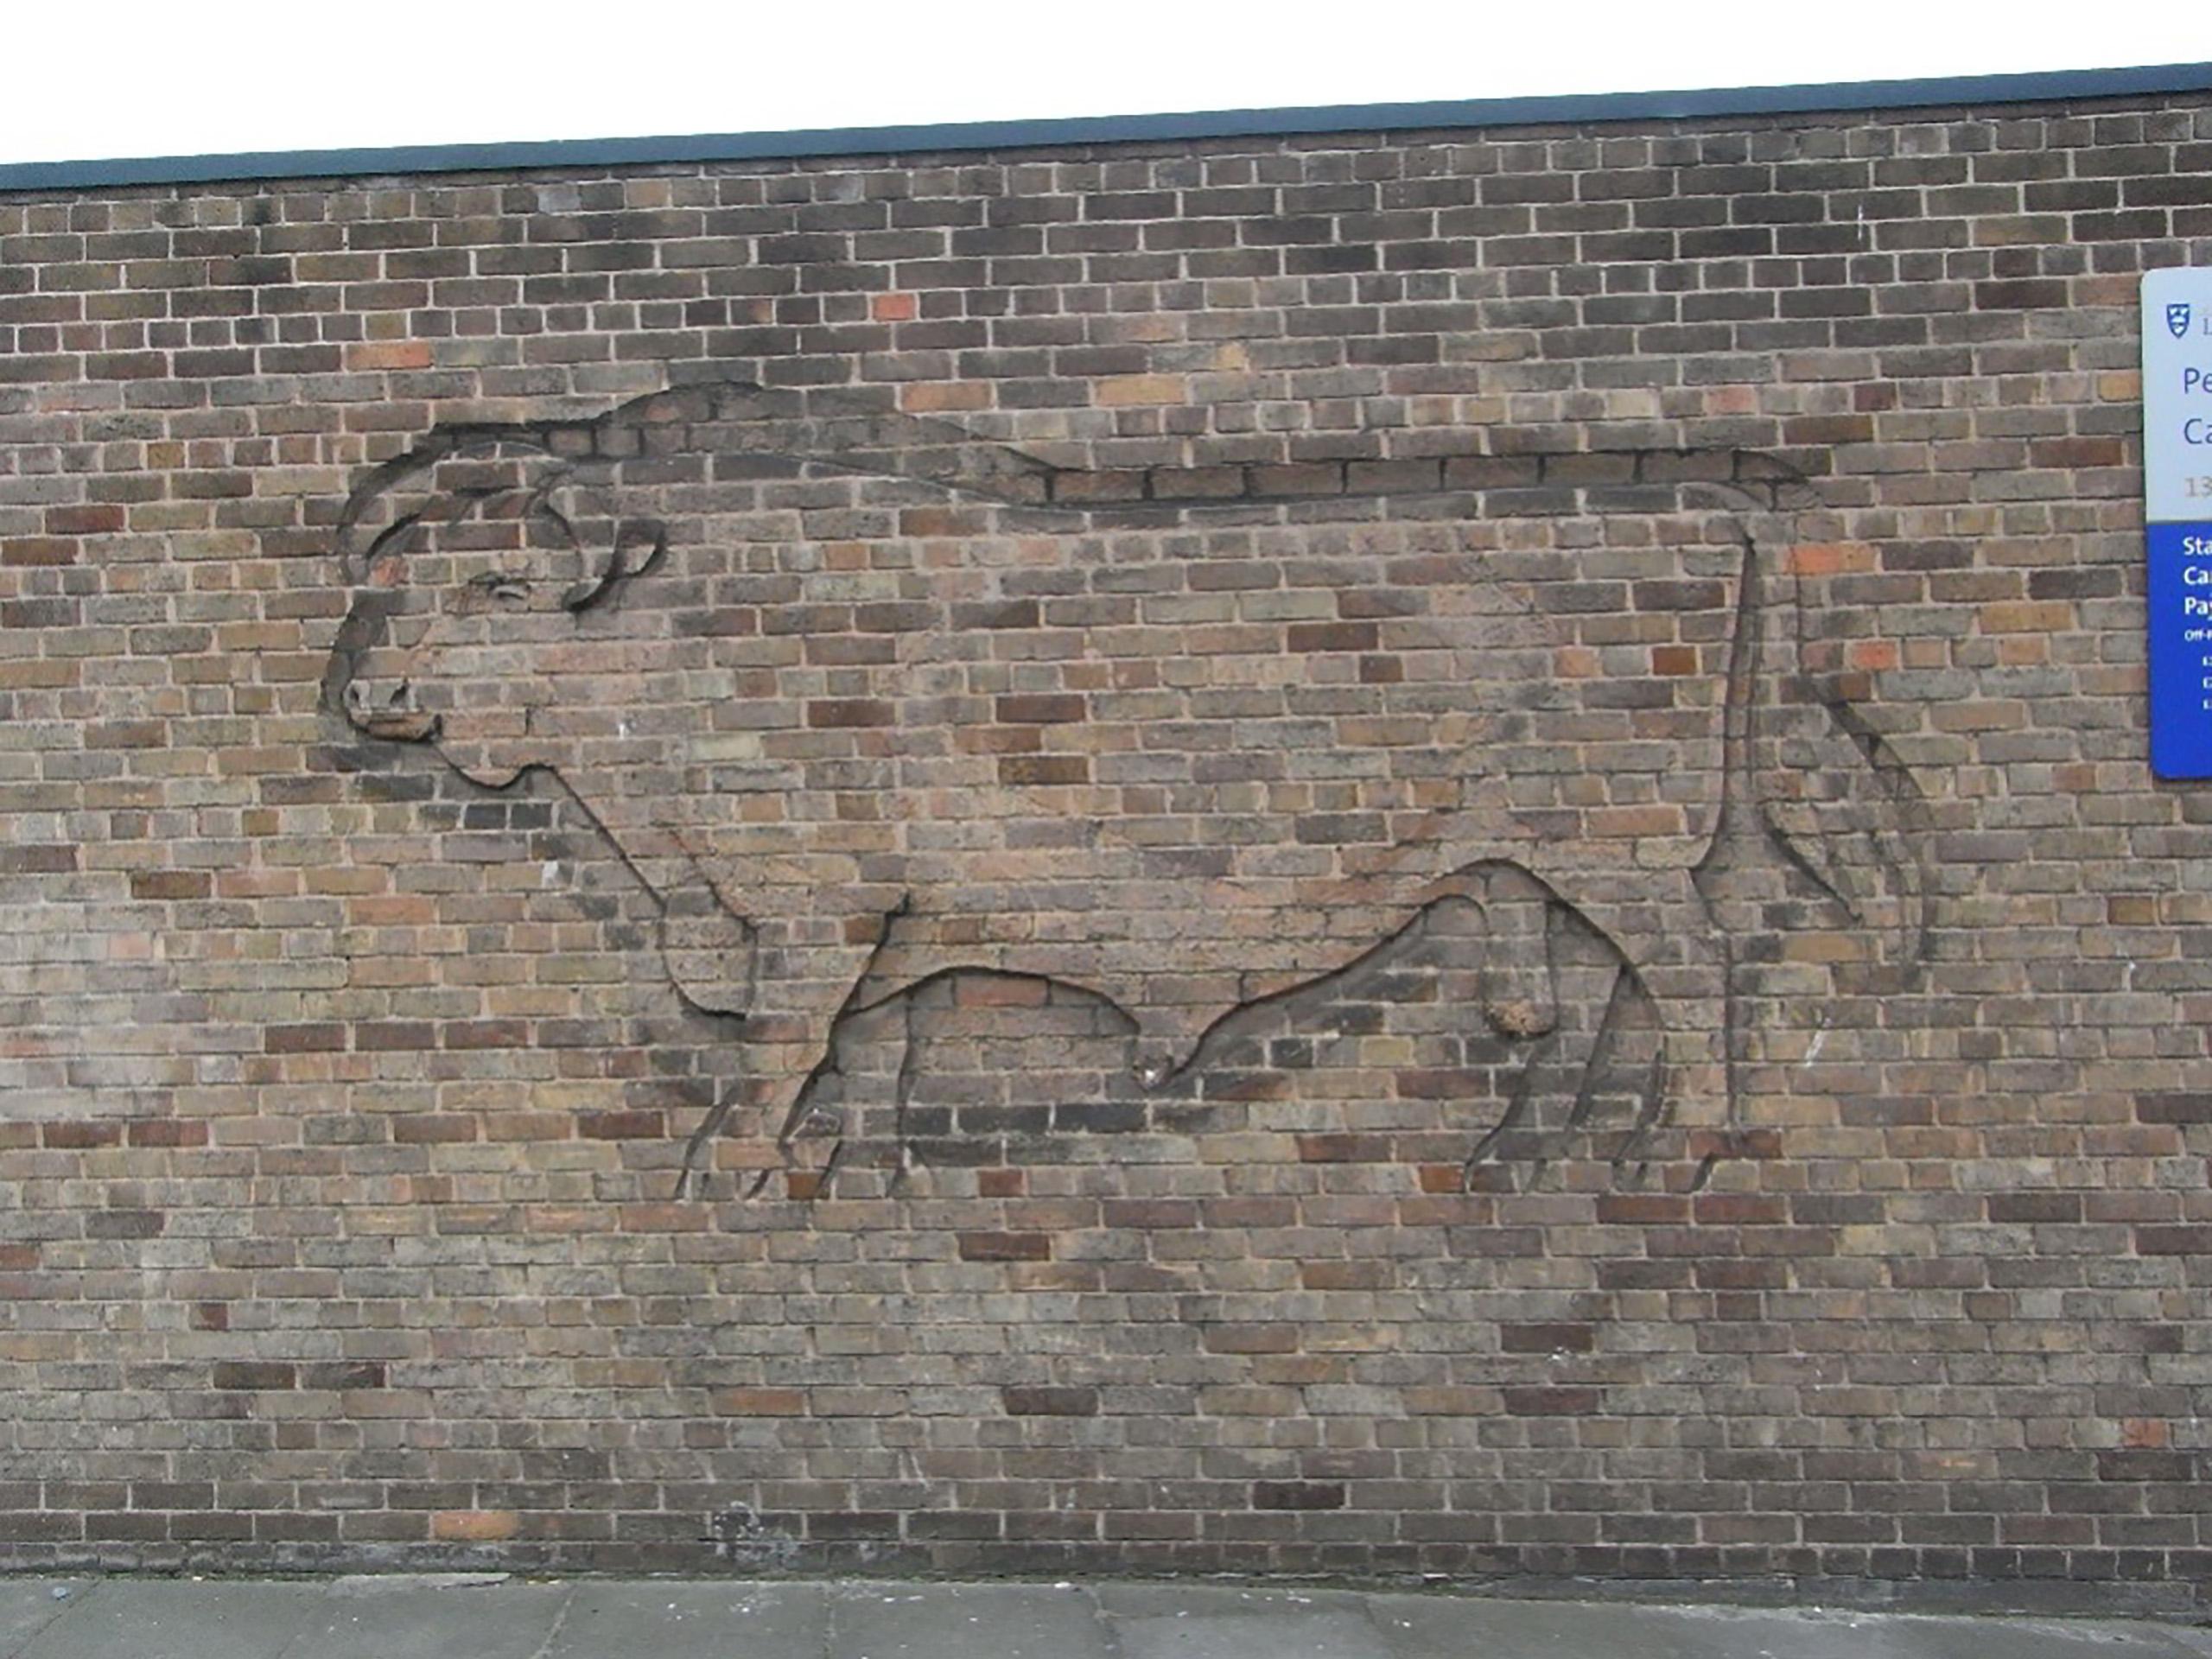 Liverpool Veterinary School 1